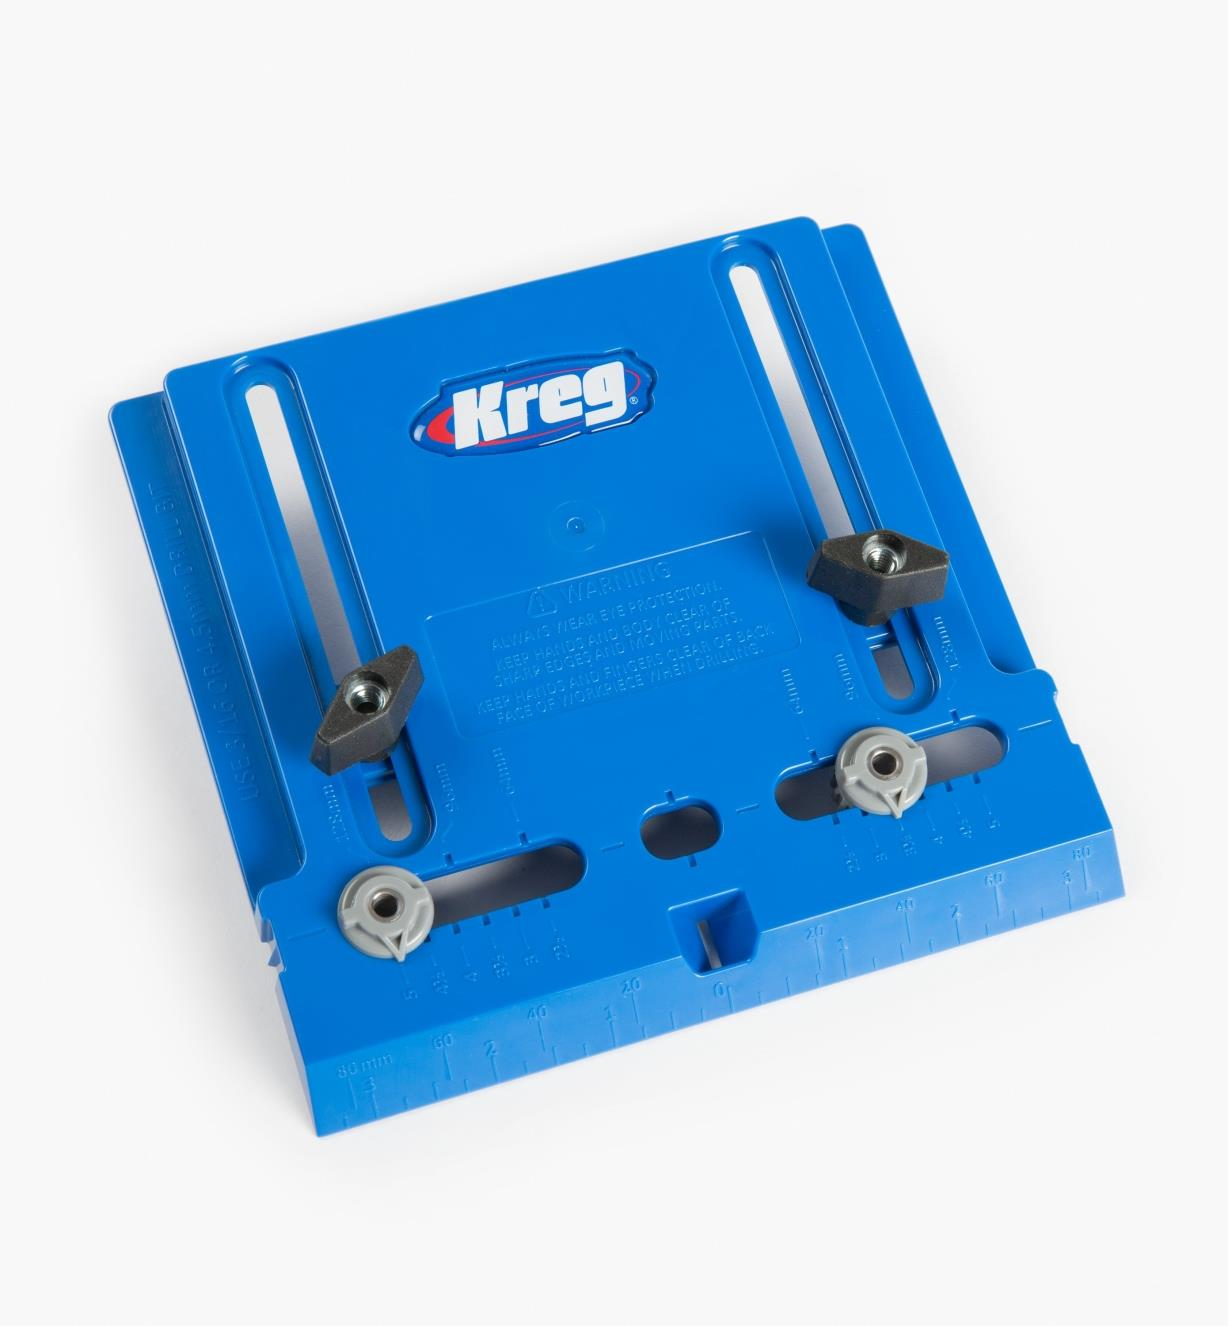 25K6069 - Kreg Hardware Jig